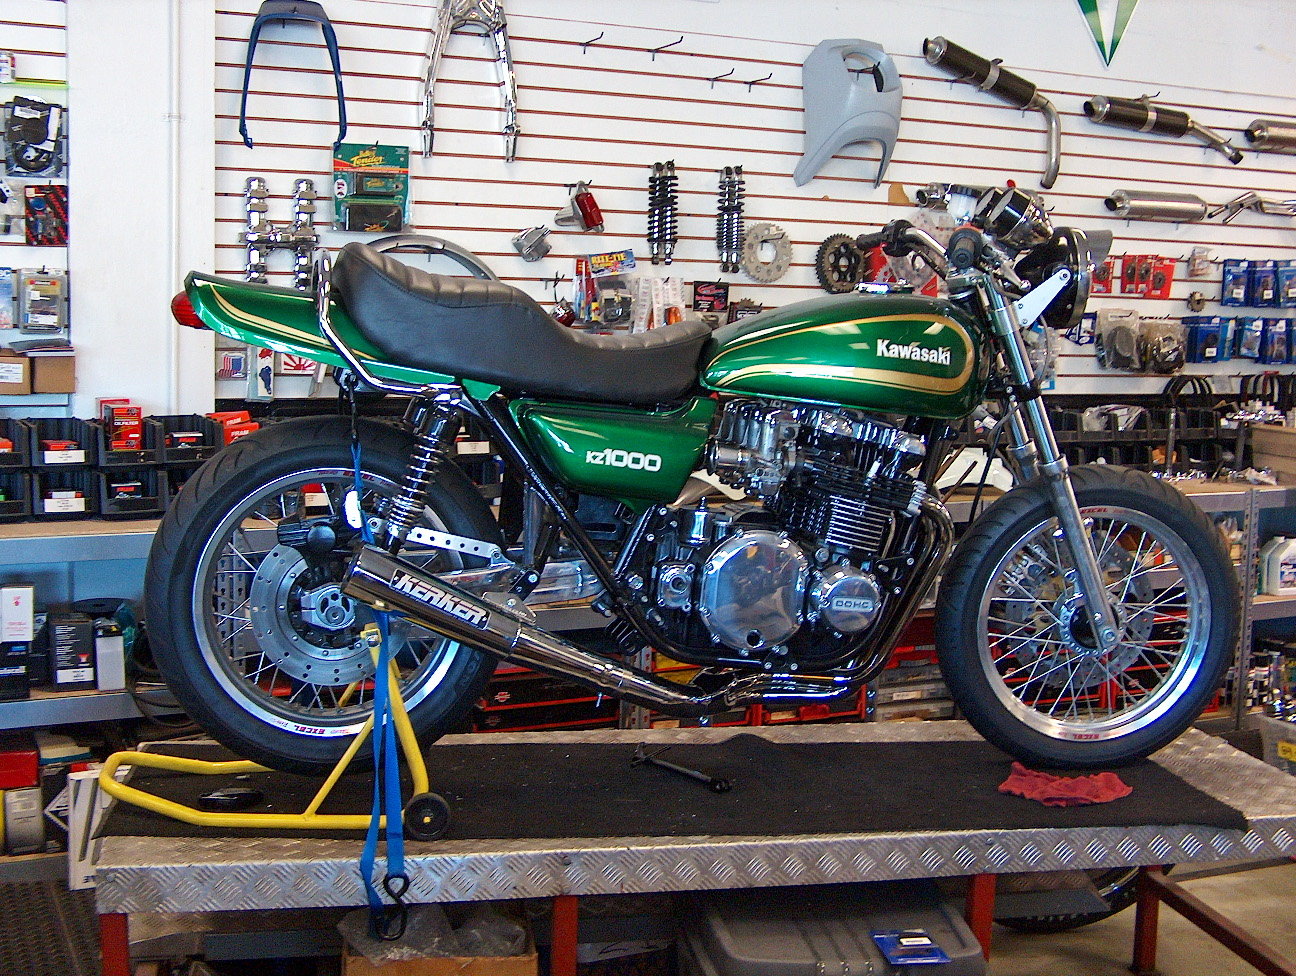 Copy of bikes n parts 41606 002 (1)